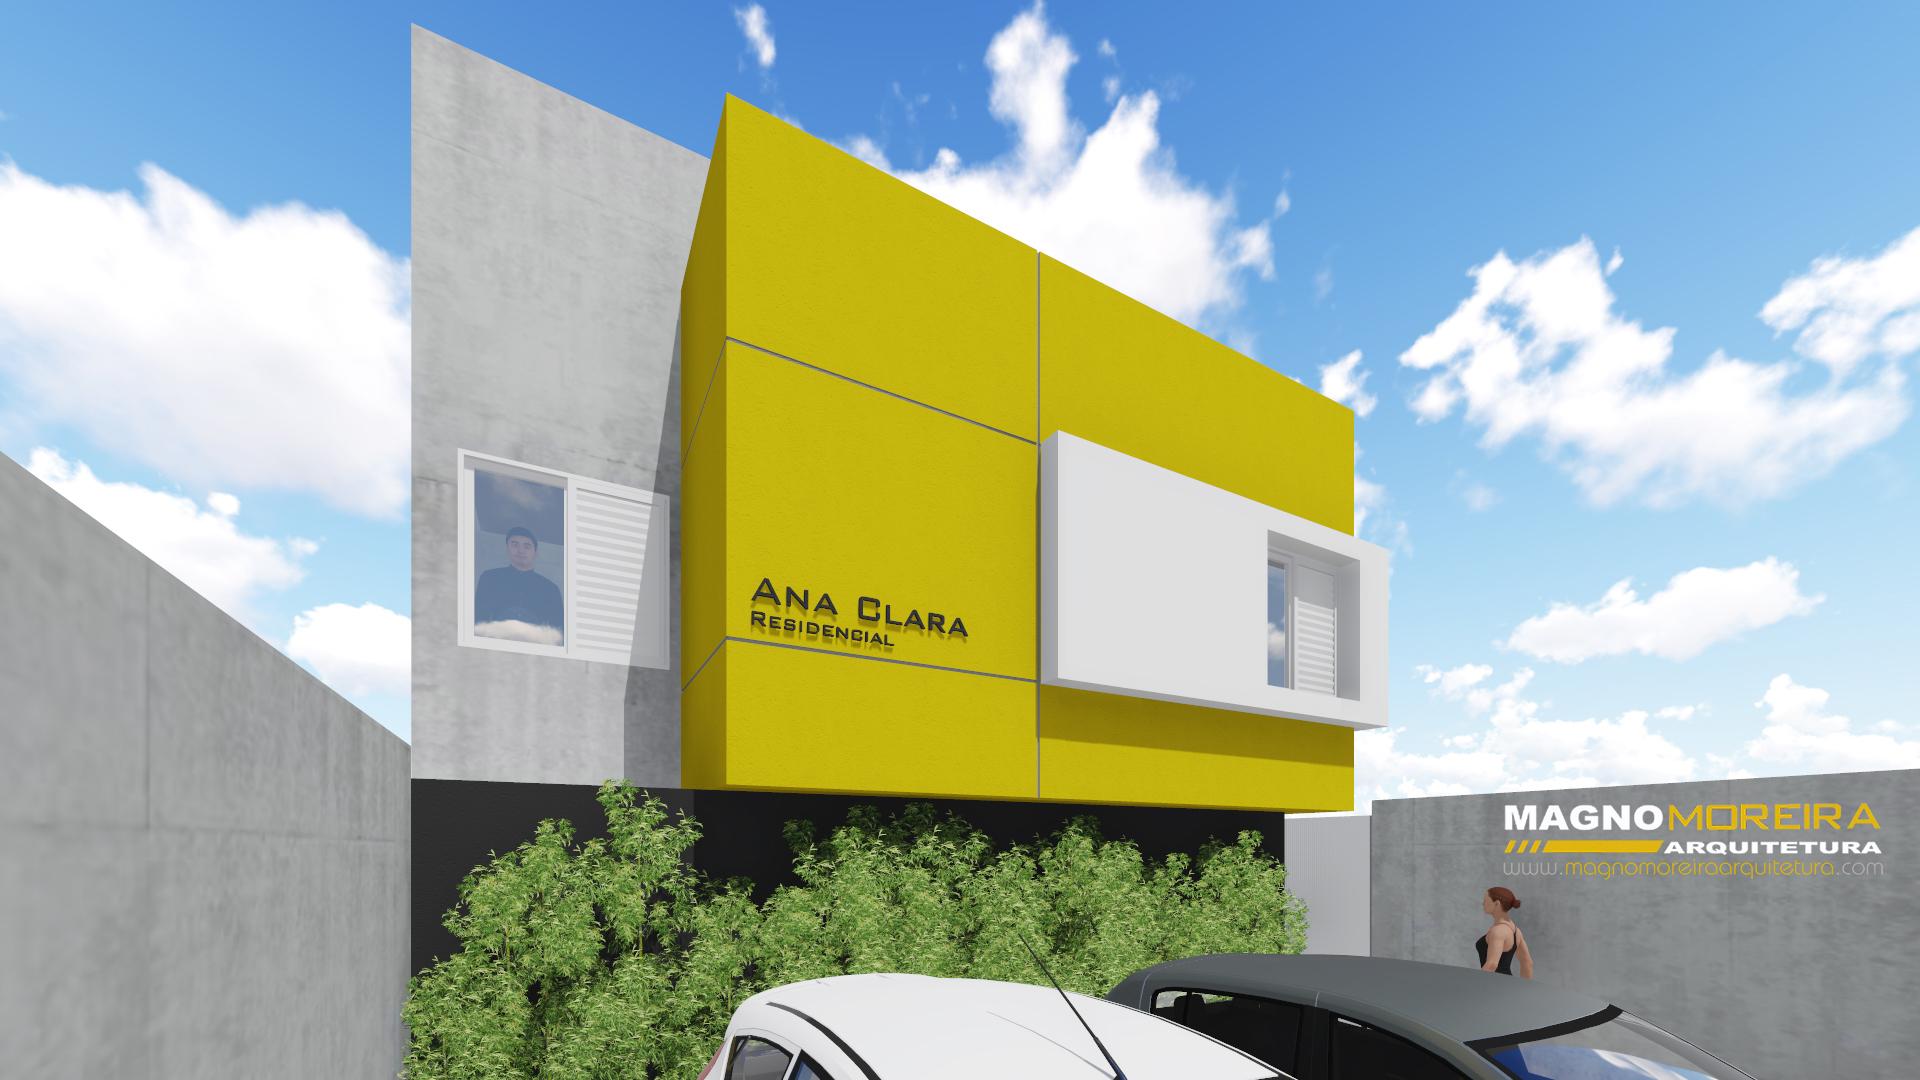 Residencial Ana Clara